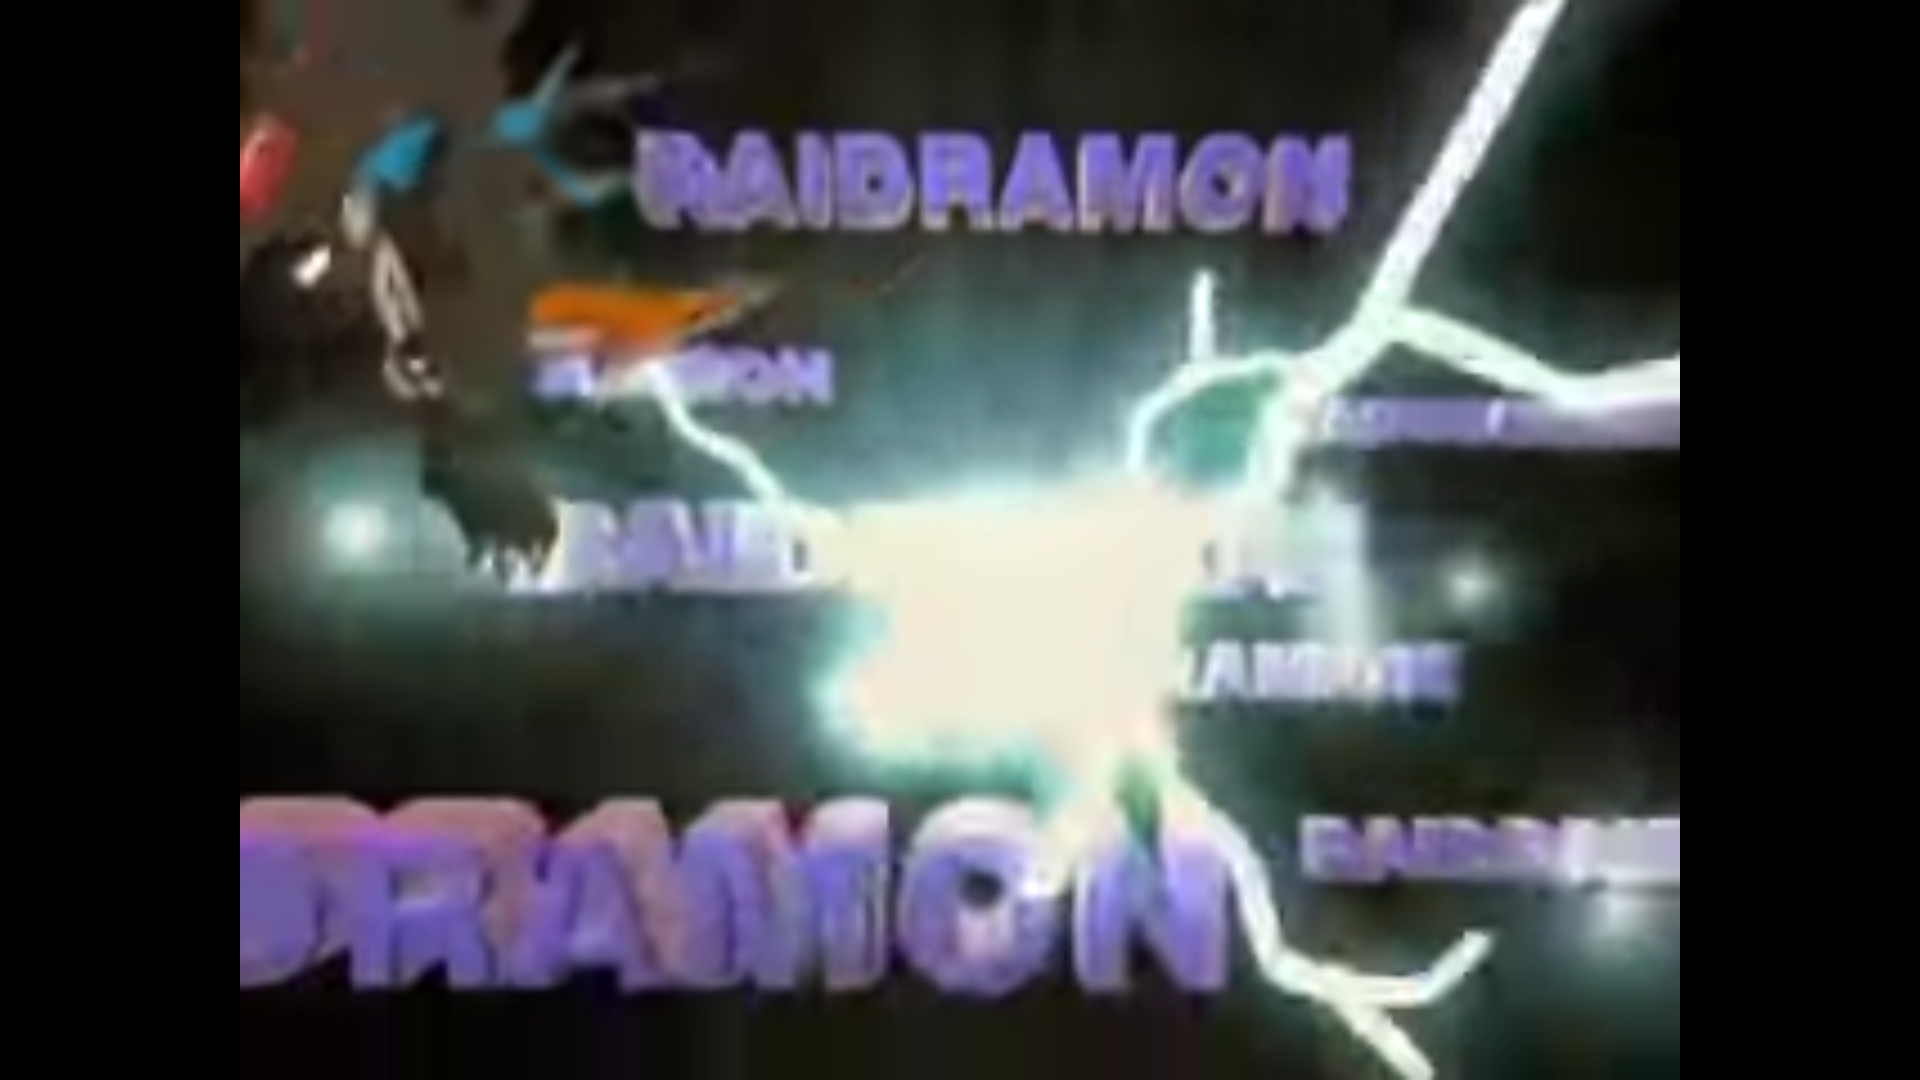 Digimon cool